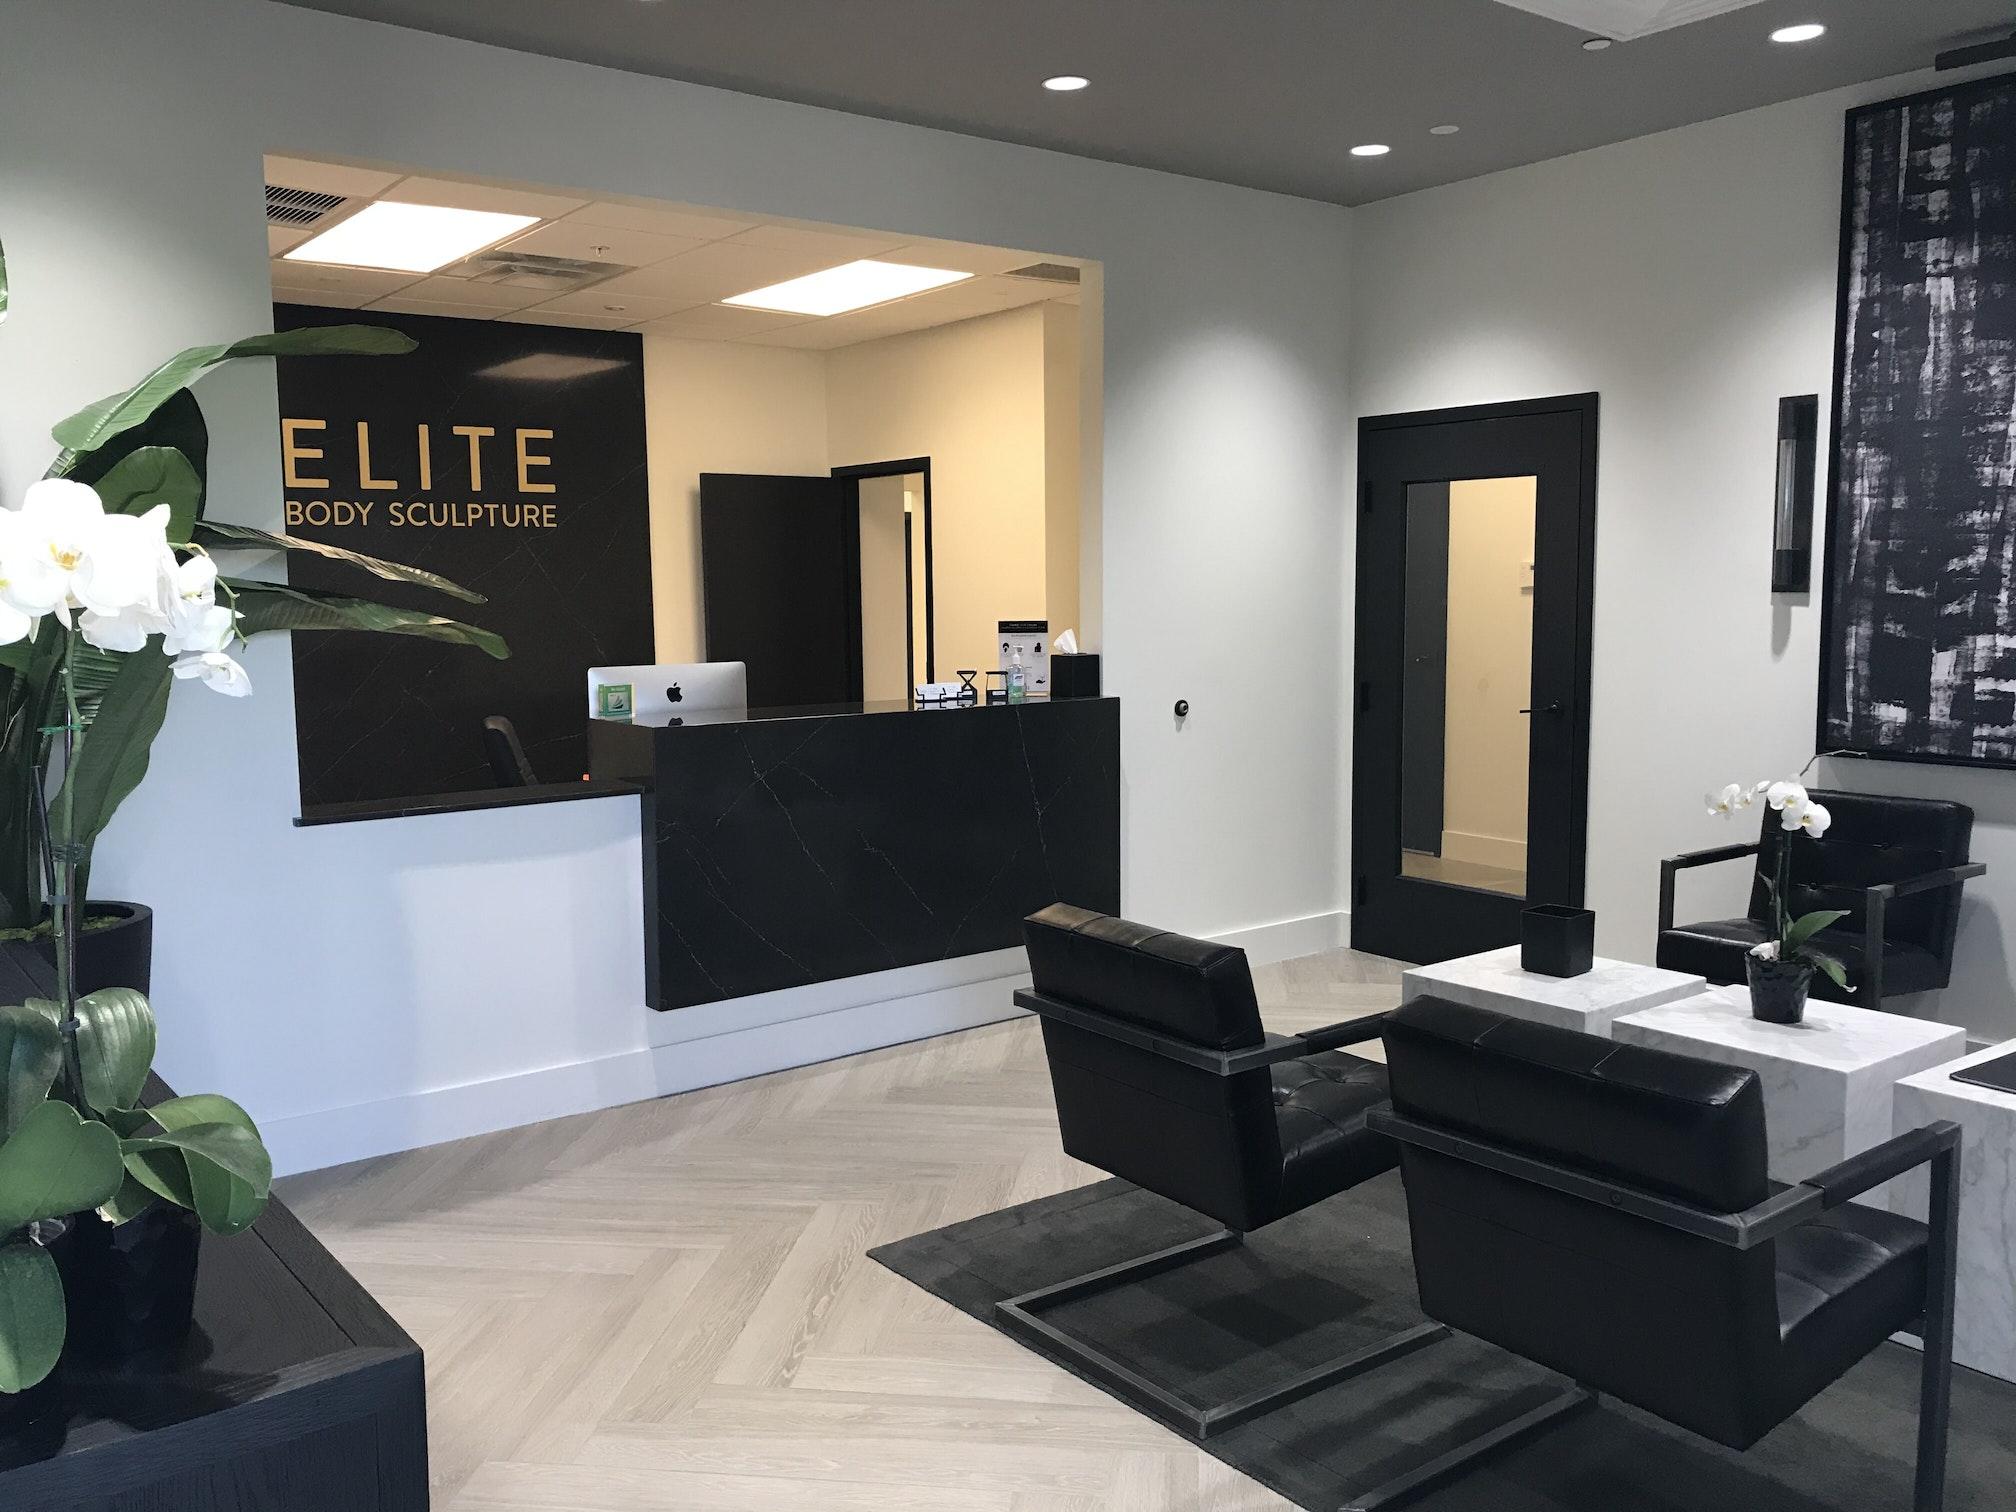 Elite Body Sculpture Orlando office